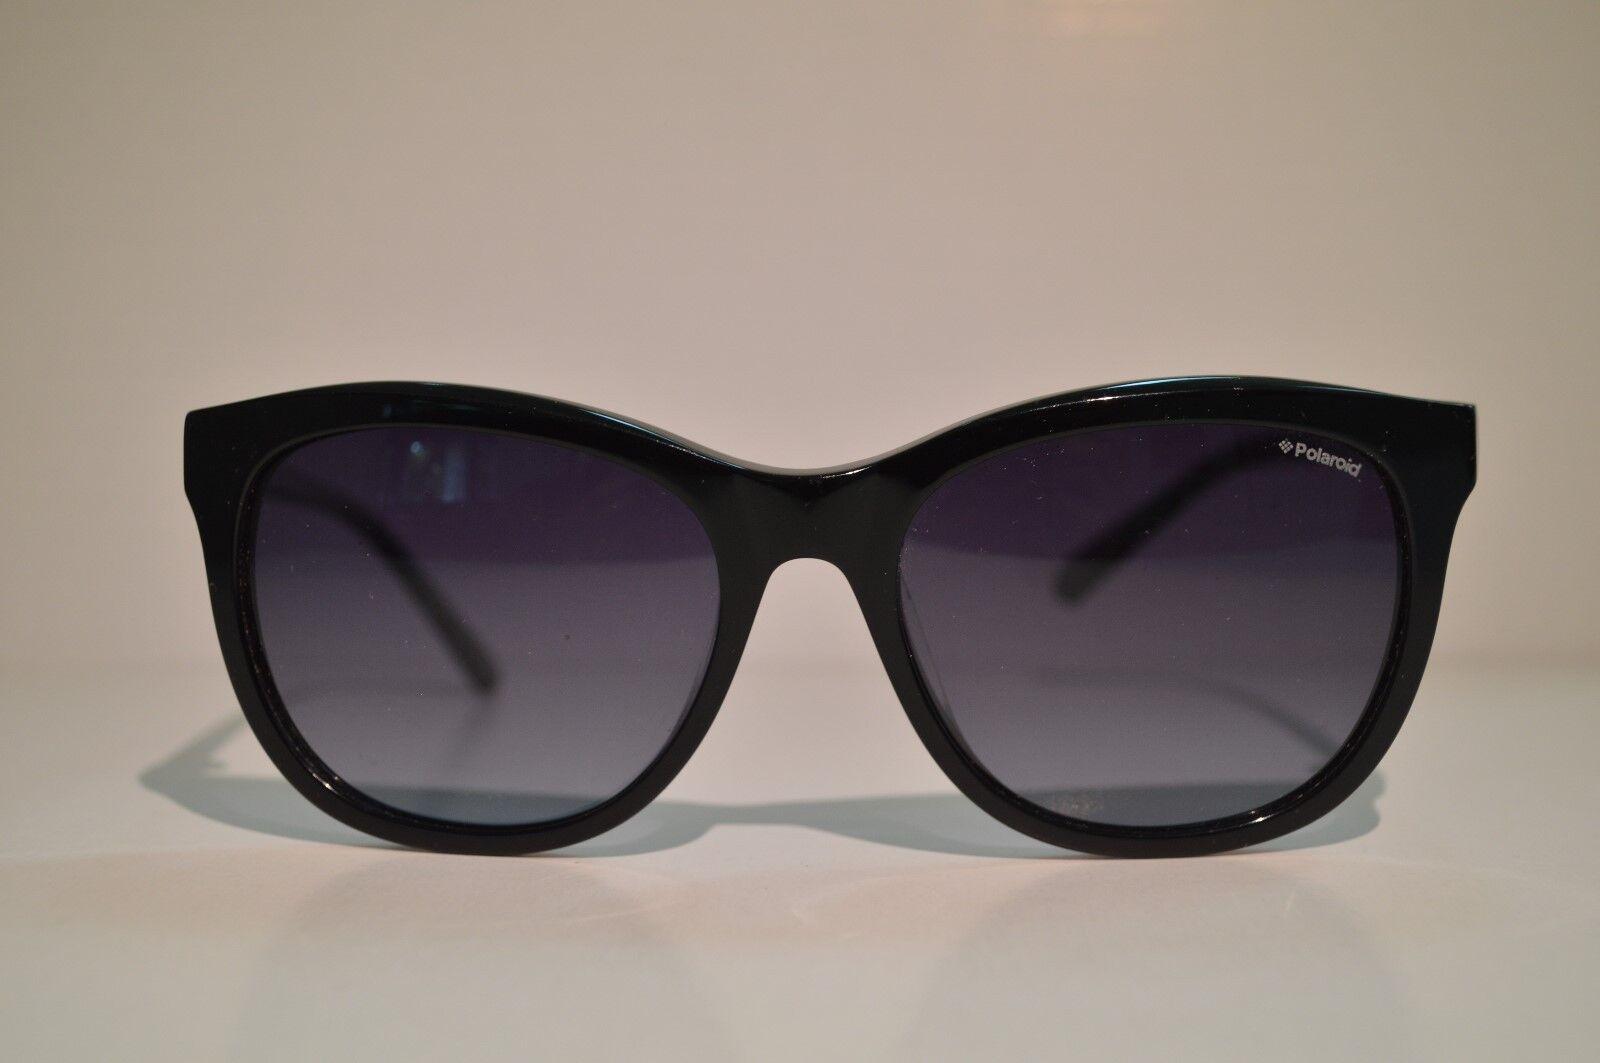 89db0f8546c Authentic Women's Polaroid Black Sunglasses PLD 4004/s 807 for sale ...